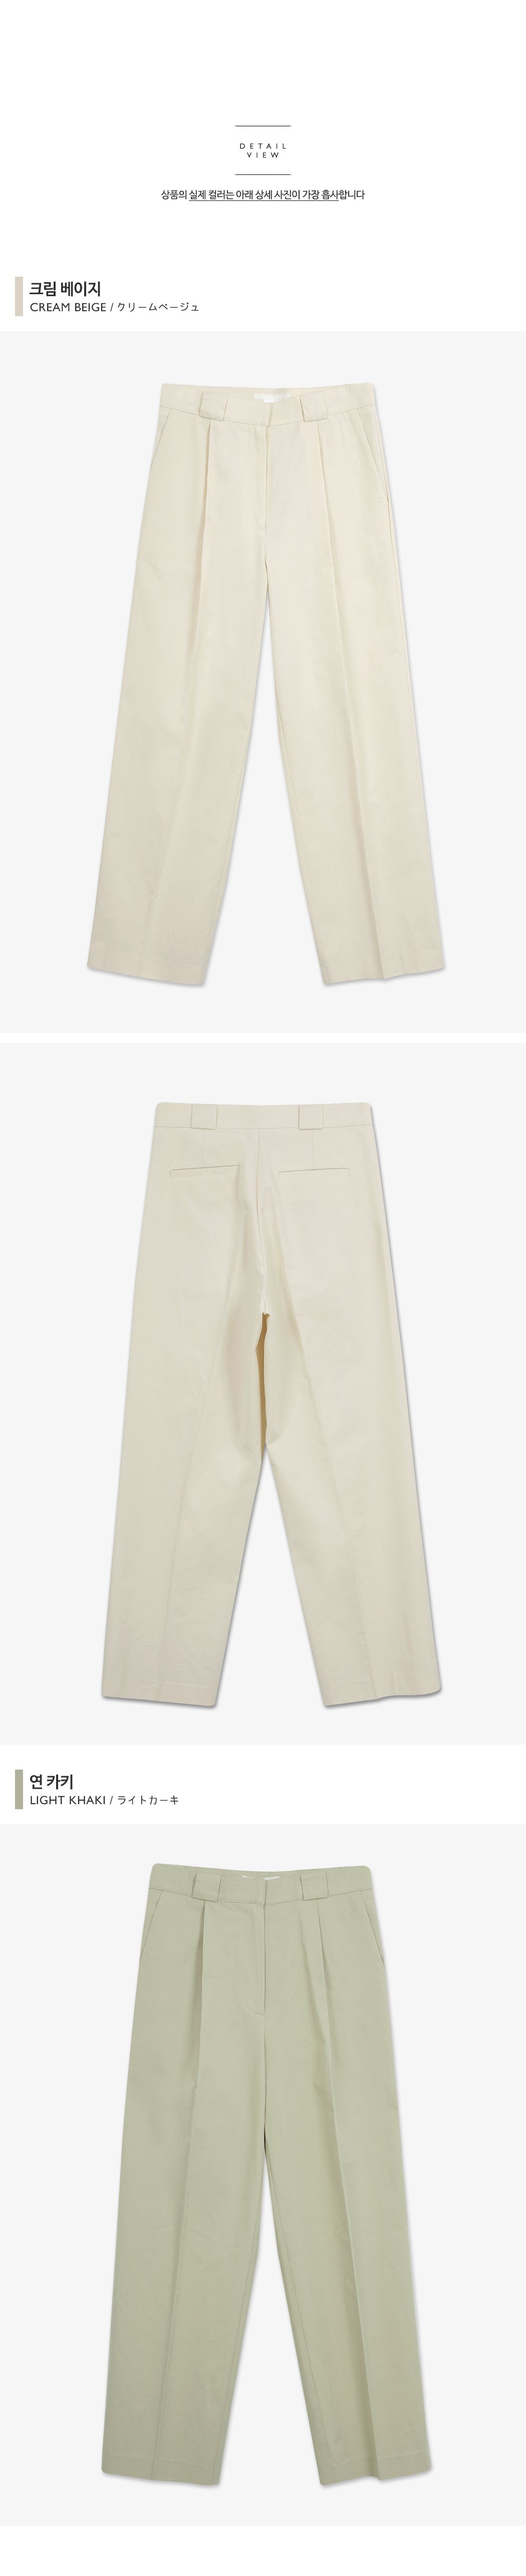 Maroon cotton pintuck pants